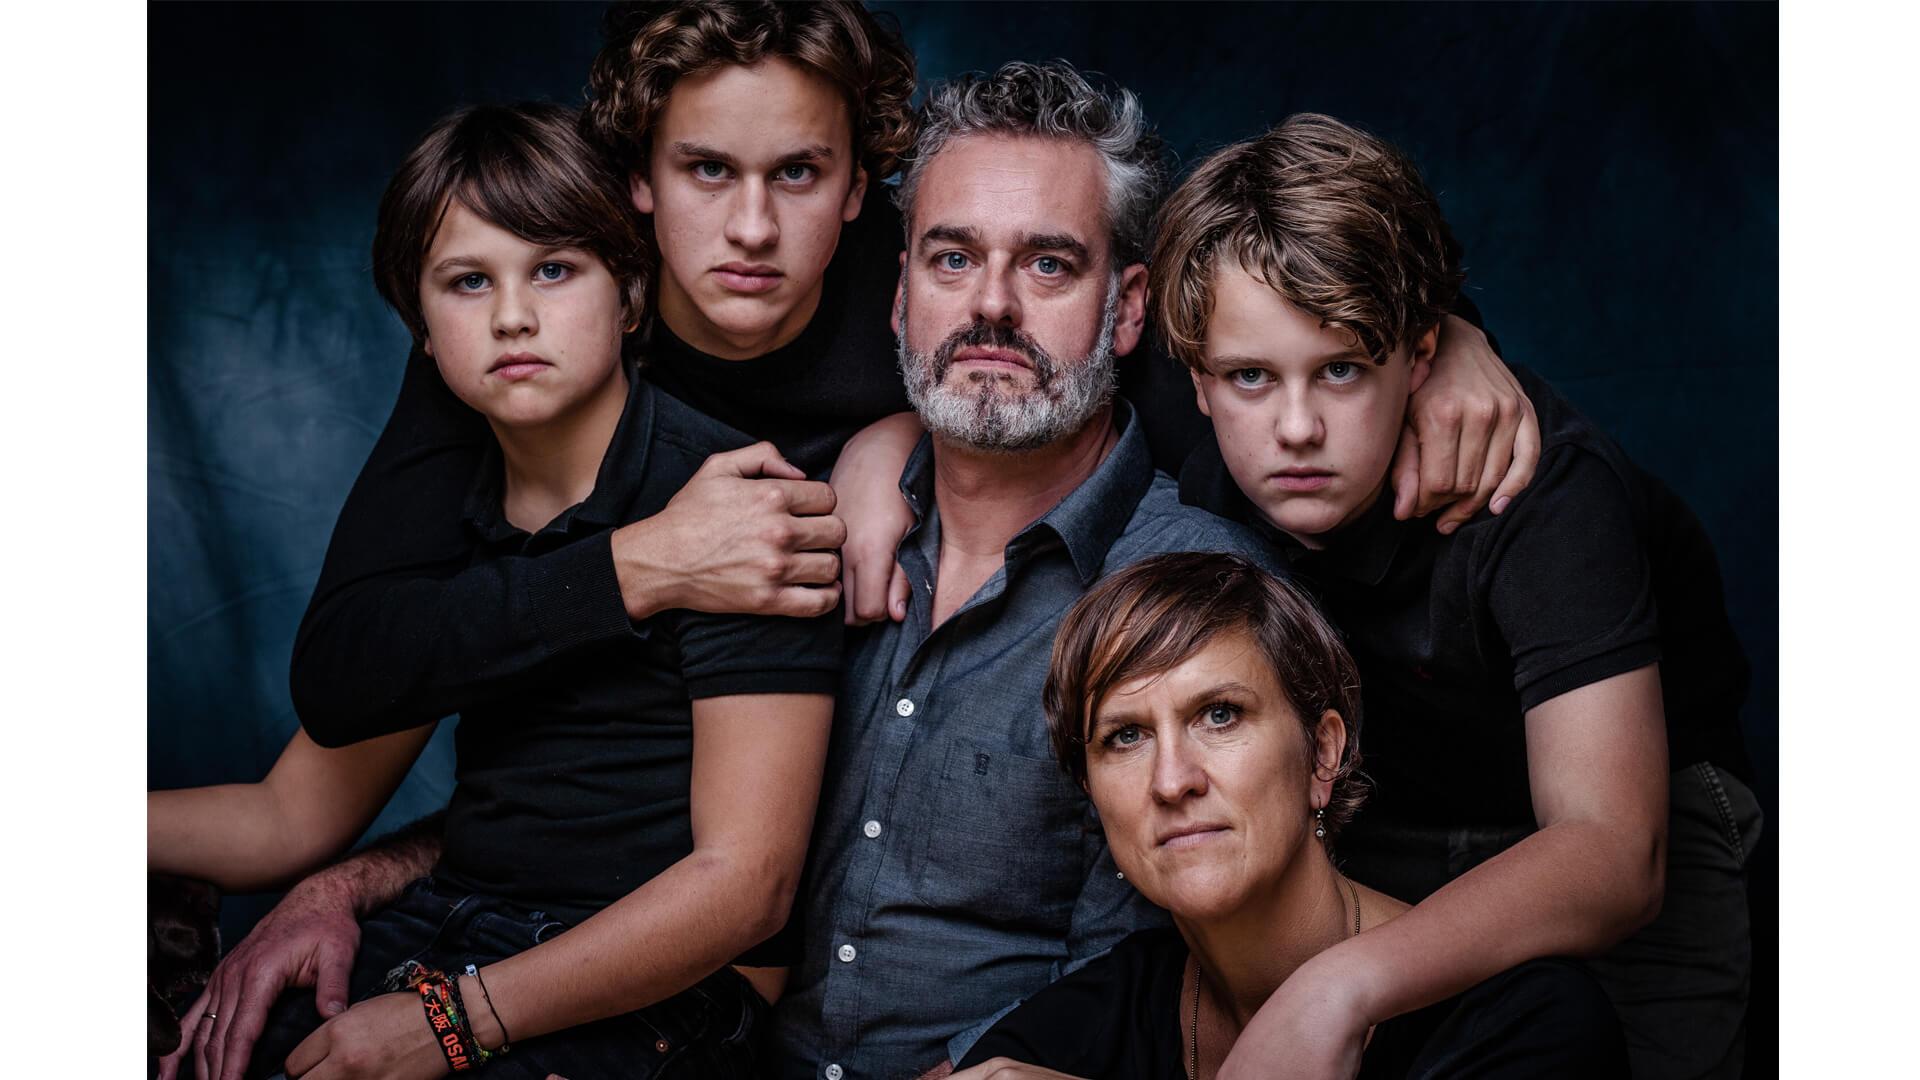 Familie van der Berg